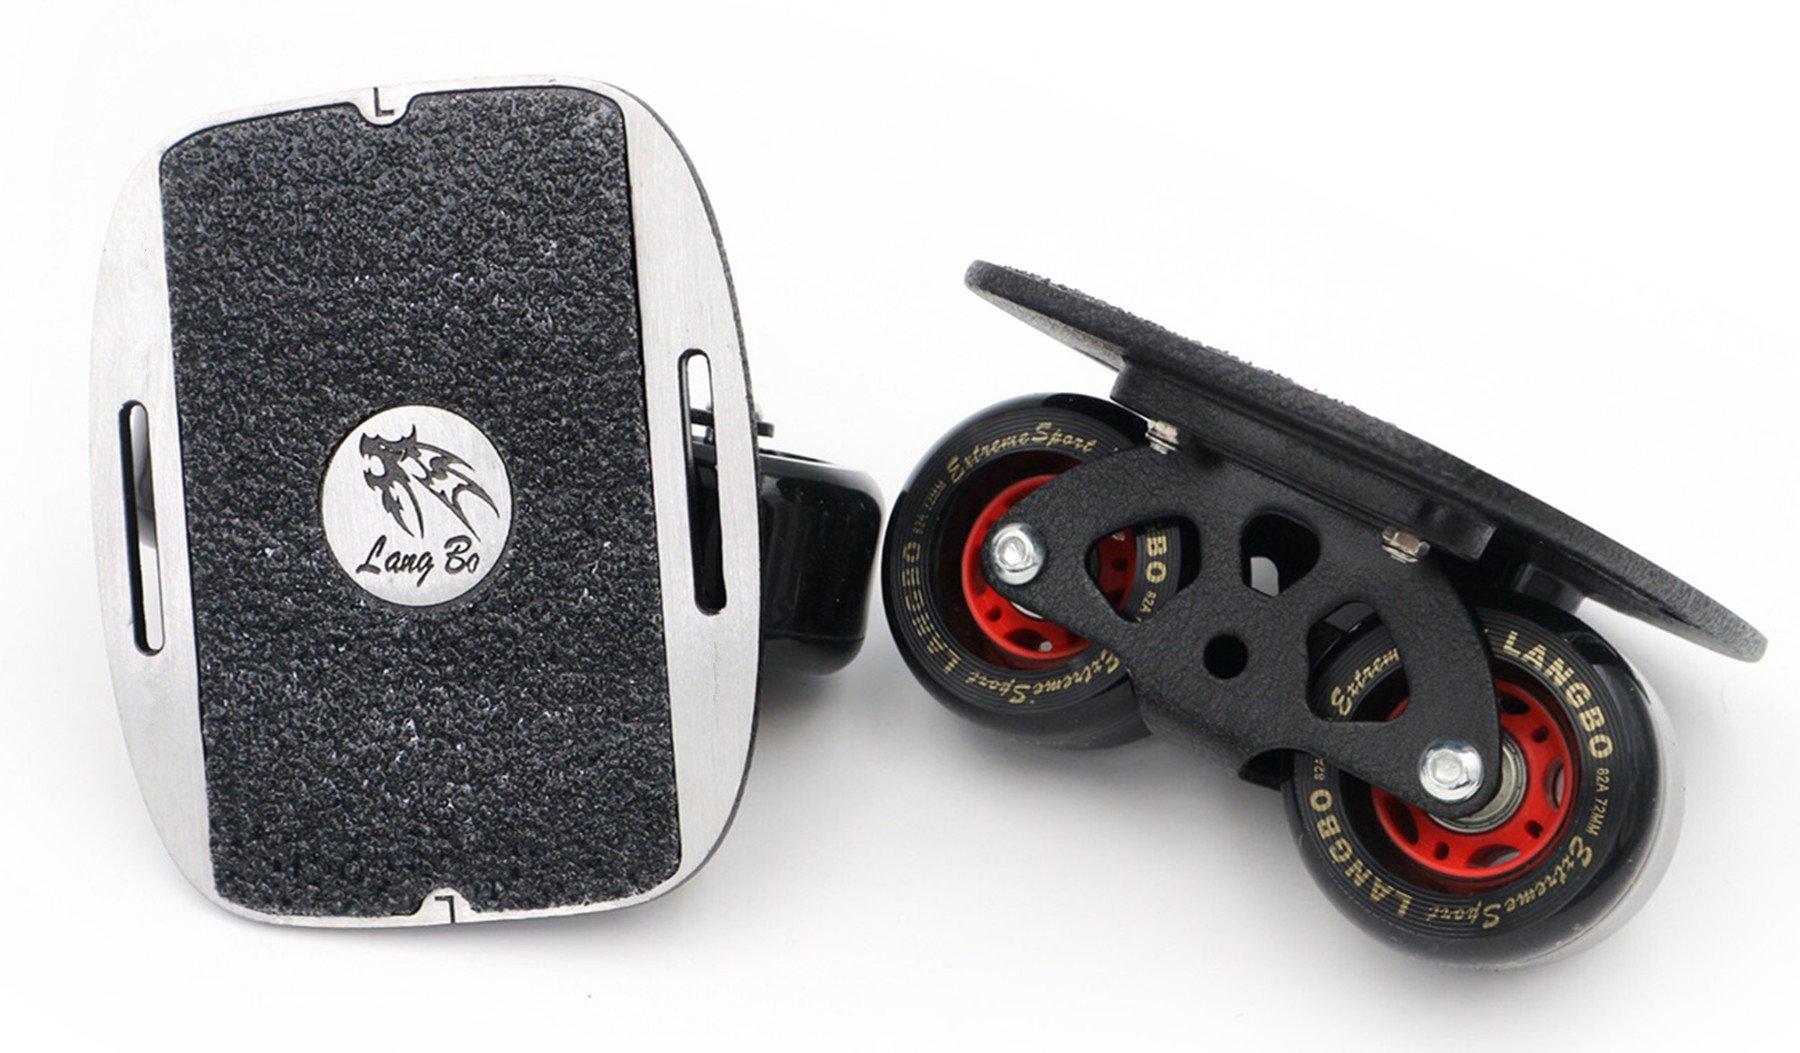 Roller Road Drift Skate Plates Portable Anti-Slip Board Split Skateboard All-in-one Aluminum Alloy with PU Wheels (Black) by Smartuan